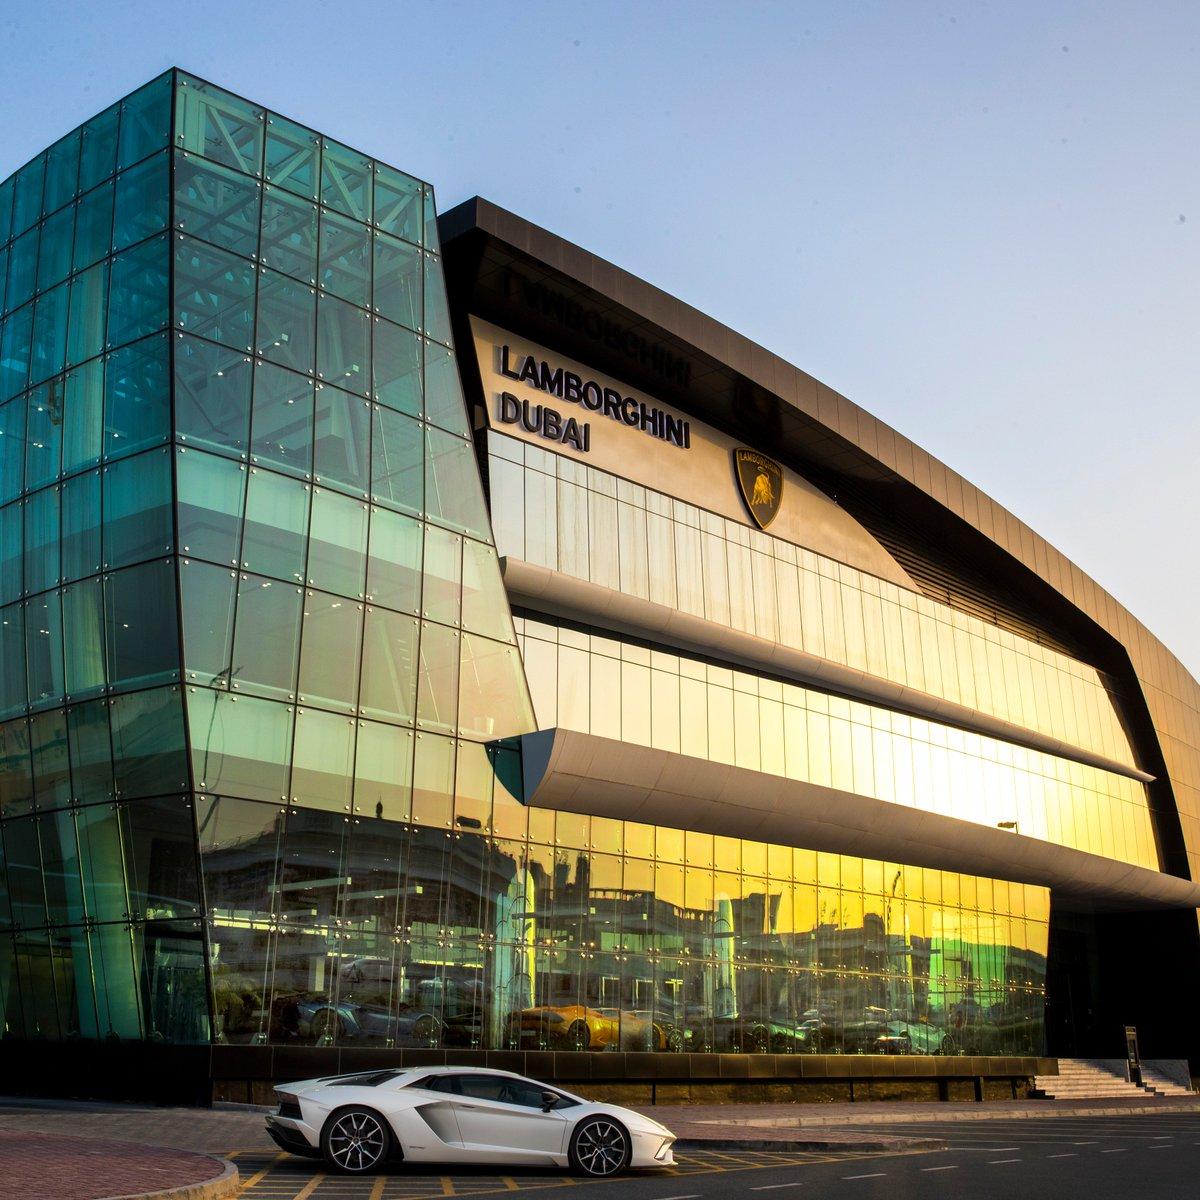 Lamborghini On Twitter We Ve Opened In Dubai The Lamborghini